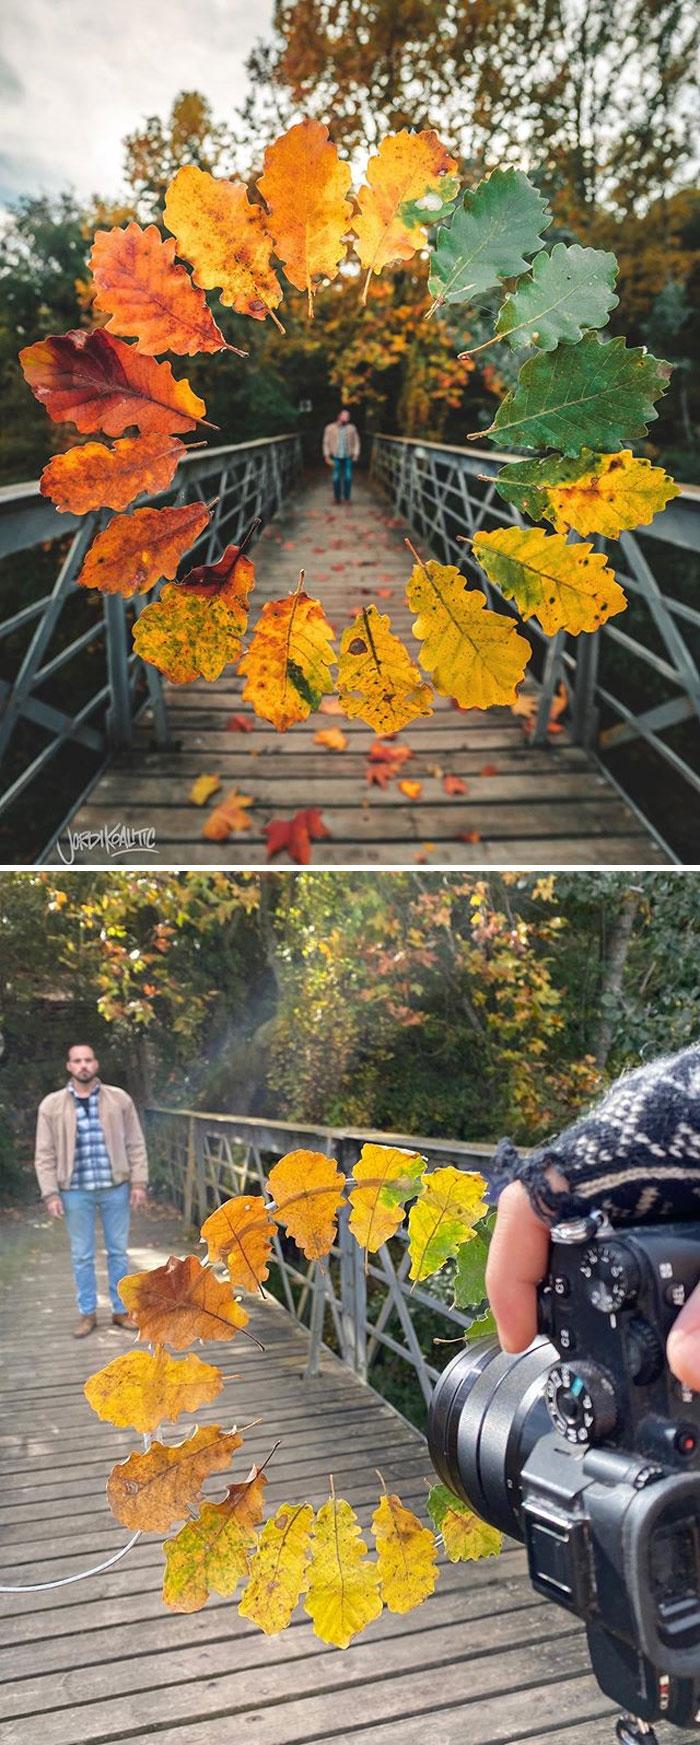 5f6db2f420bf0 photography tricks jordi koalitic 5f6b139d375d3  700 - Fotógrafo revela os bastidores de suas fotos épicas